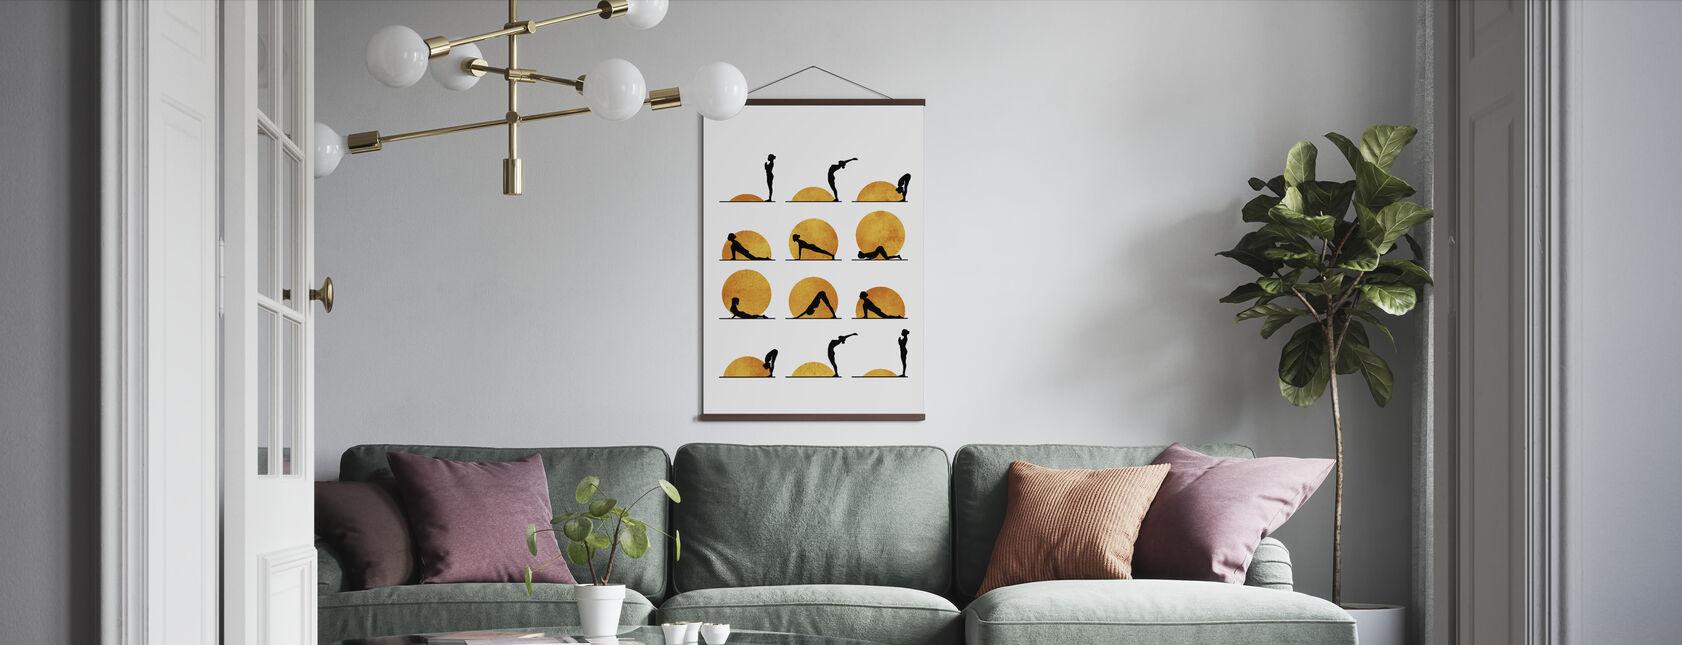 Yoga Sun - Poster - Living Room